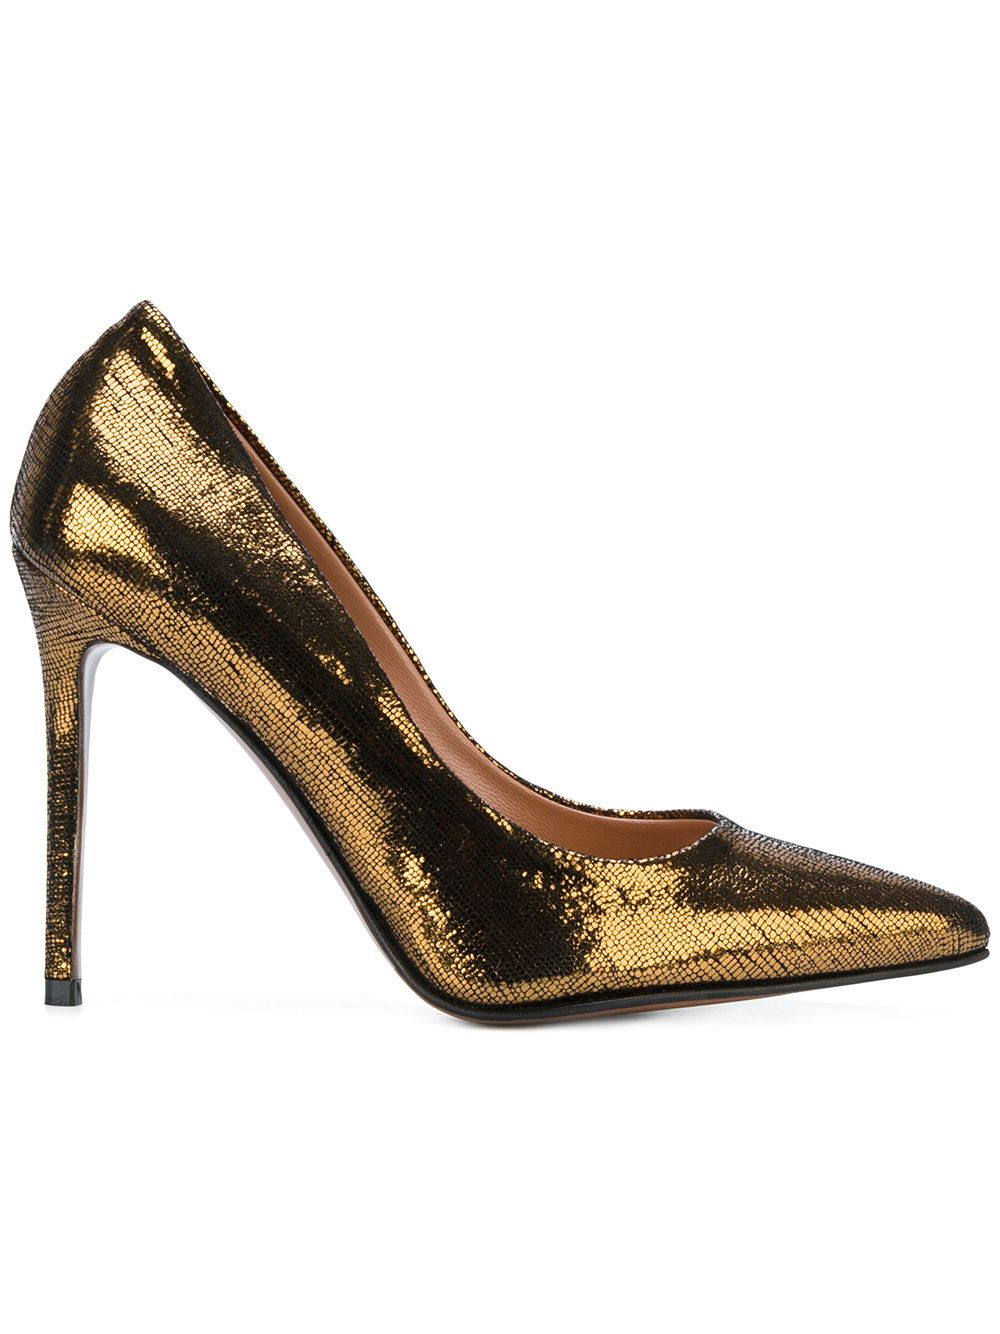 pointed toe pumps - Metallic L'autre Chose nQiKIwDsIB